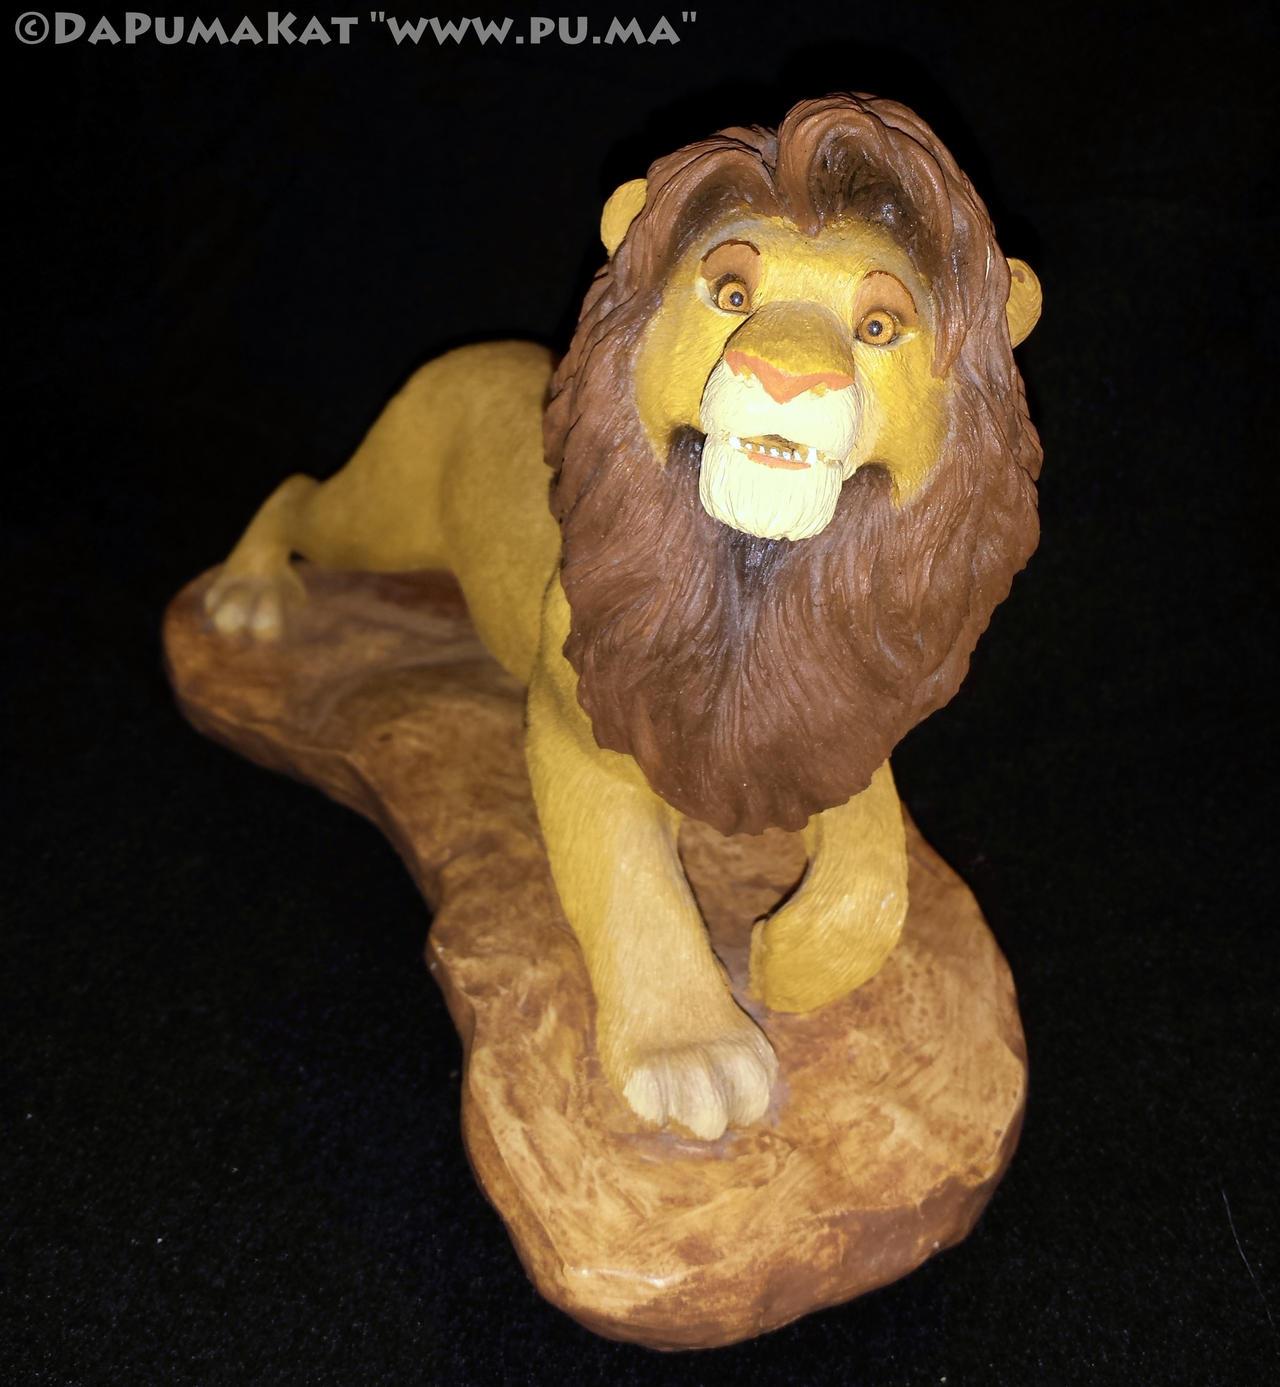 The Lion King - Adult Simba figure by Sandra Brue